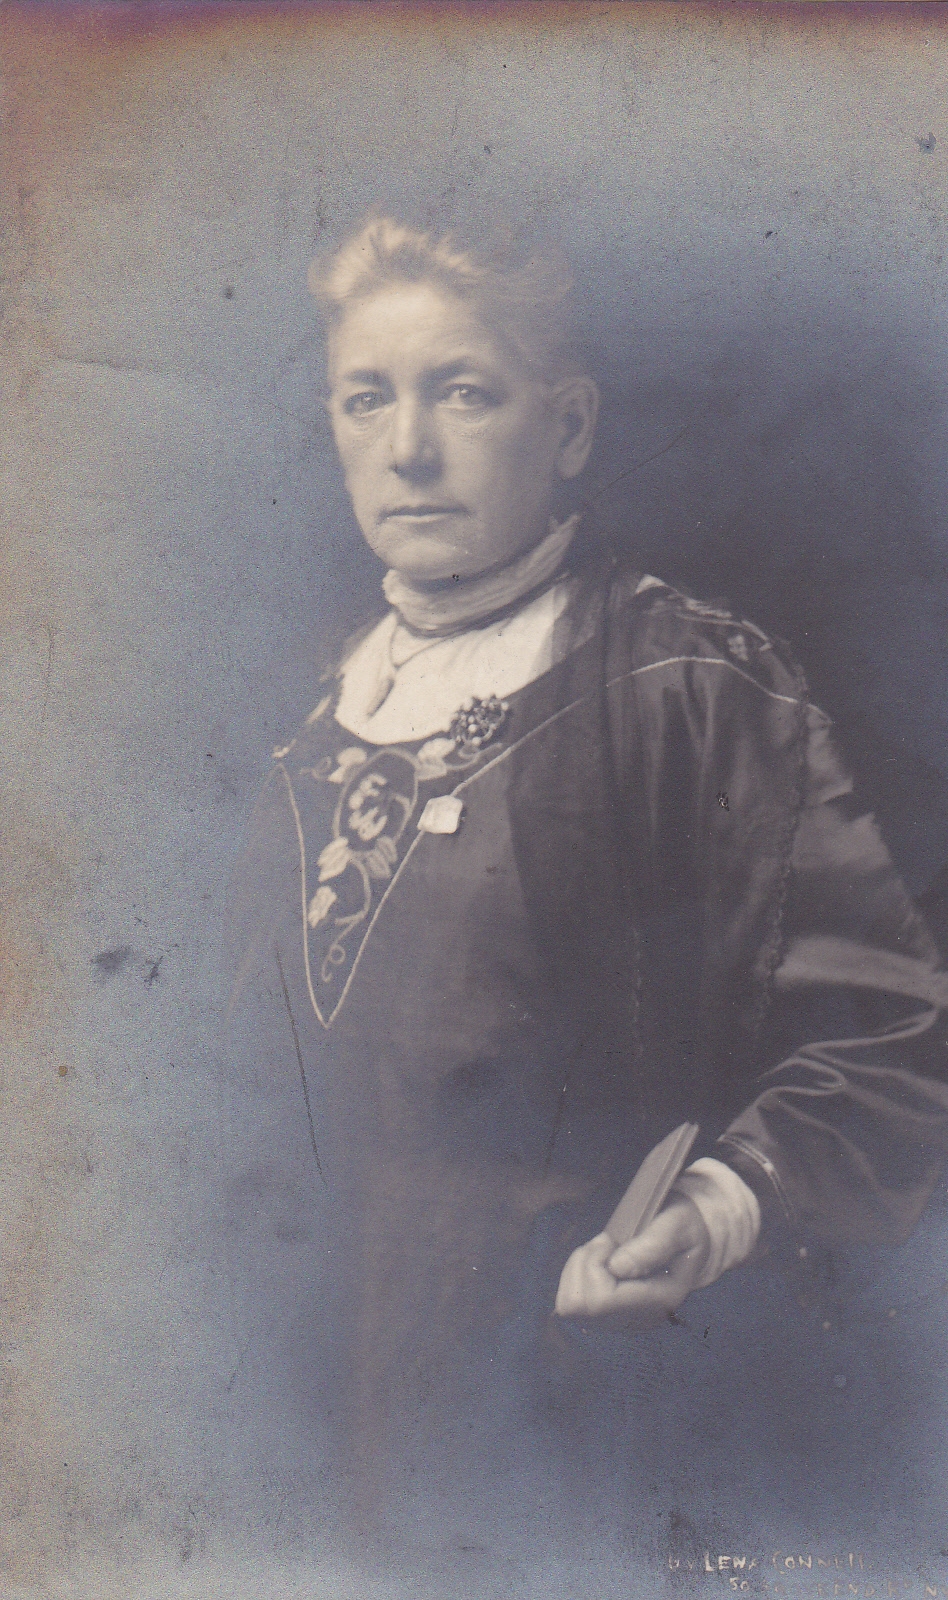 Sarah Benett, sometime treasurer of the WFL, wearing her WFL 'Holloway' brooch